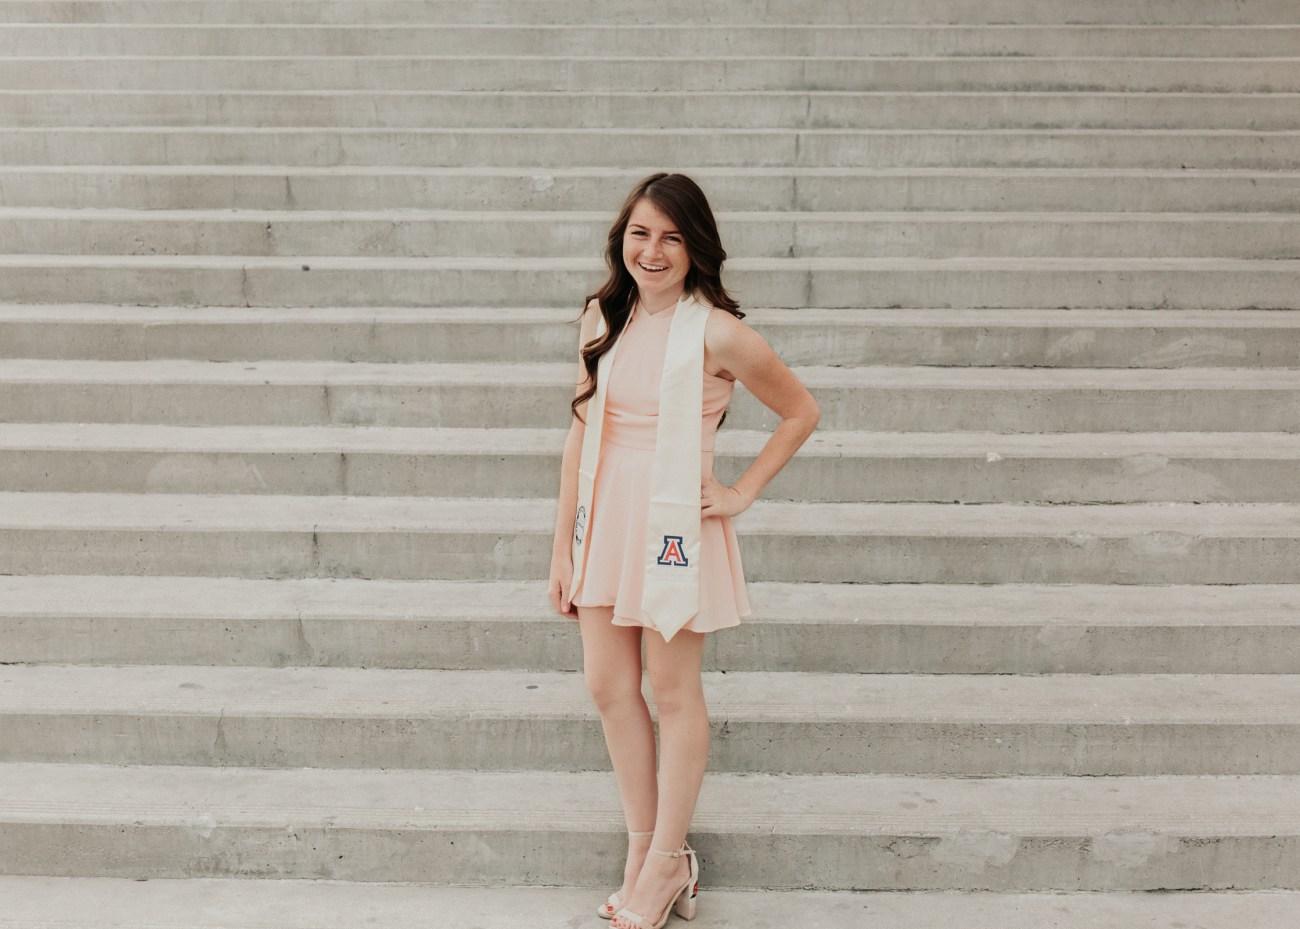 Megan Claire Photography | Arizona Wedding and Portrait Photographer. University of Arizona grad photoshoot. @meganclairephoto